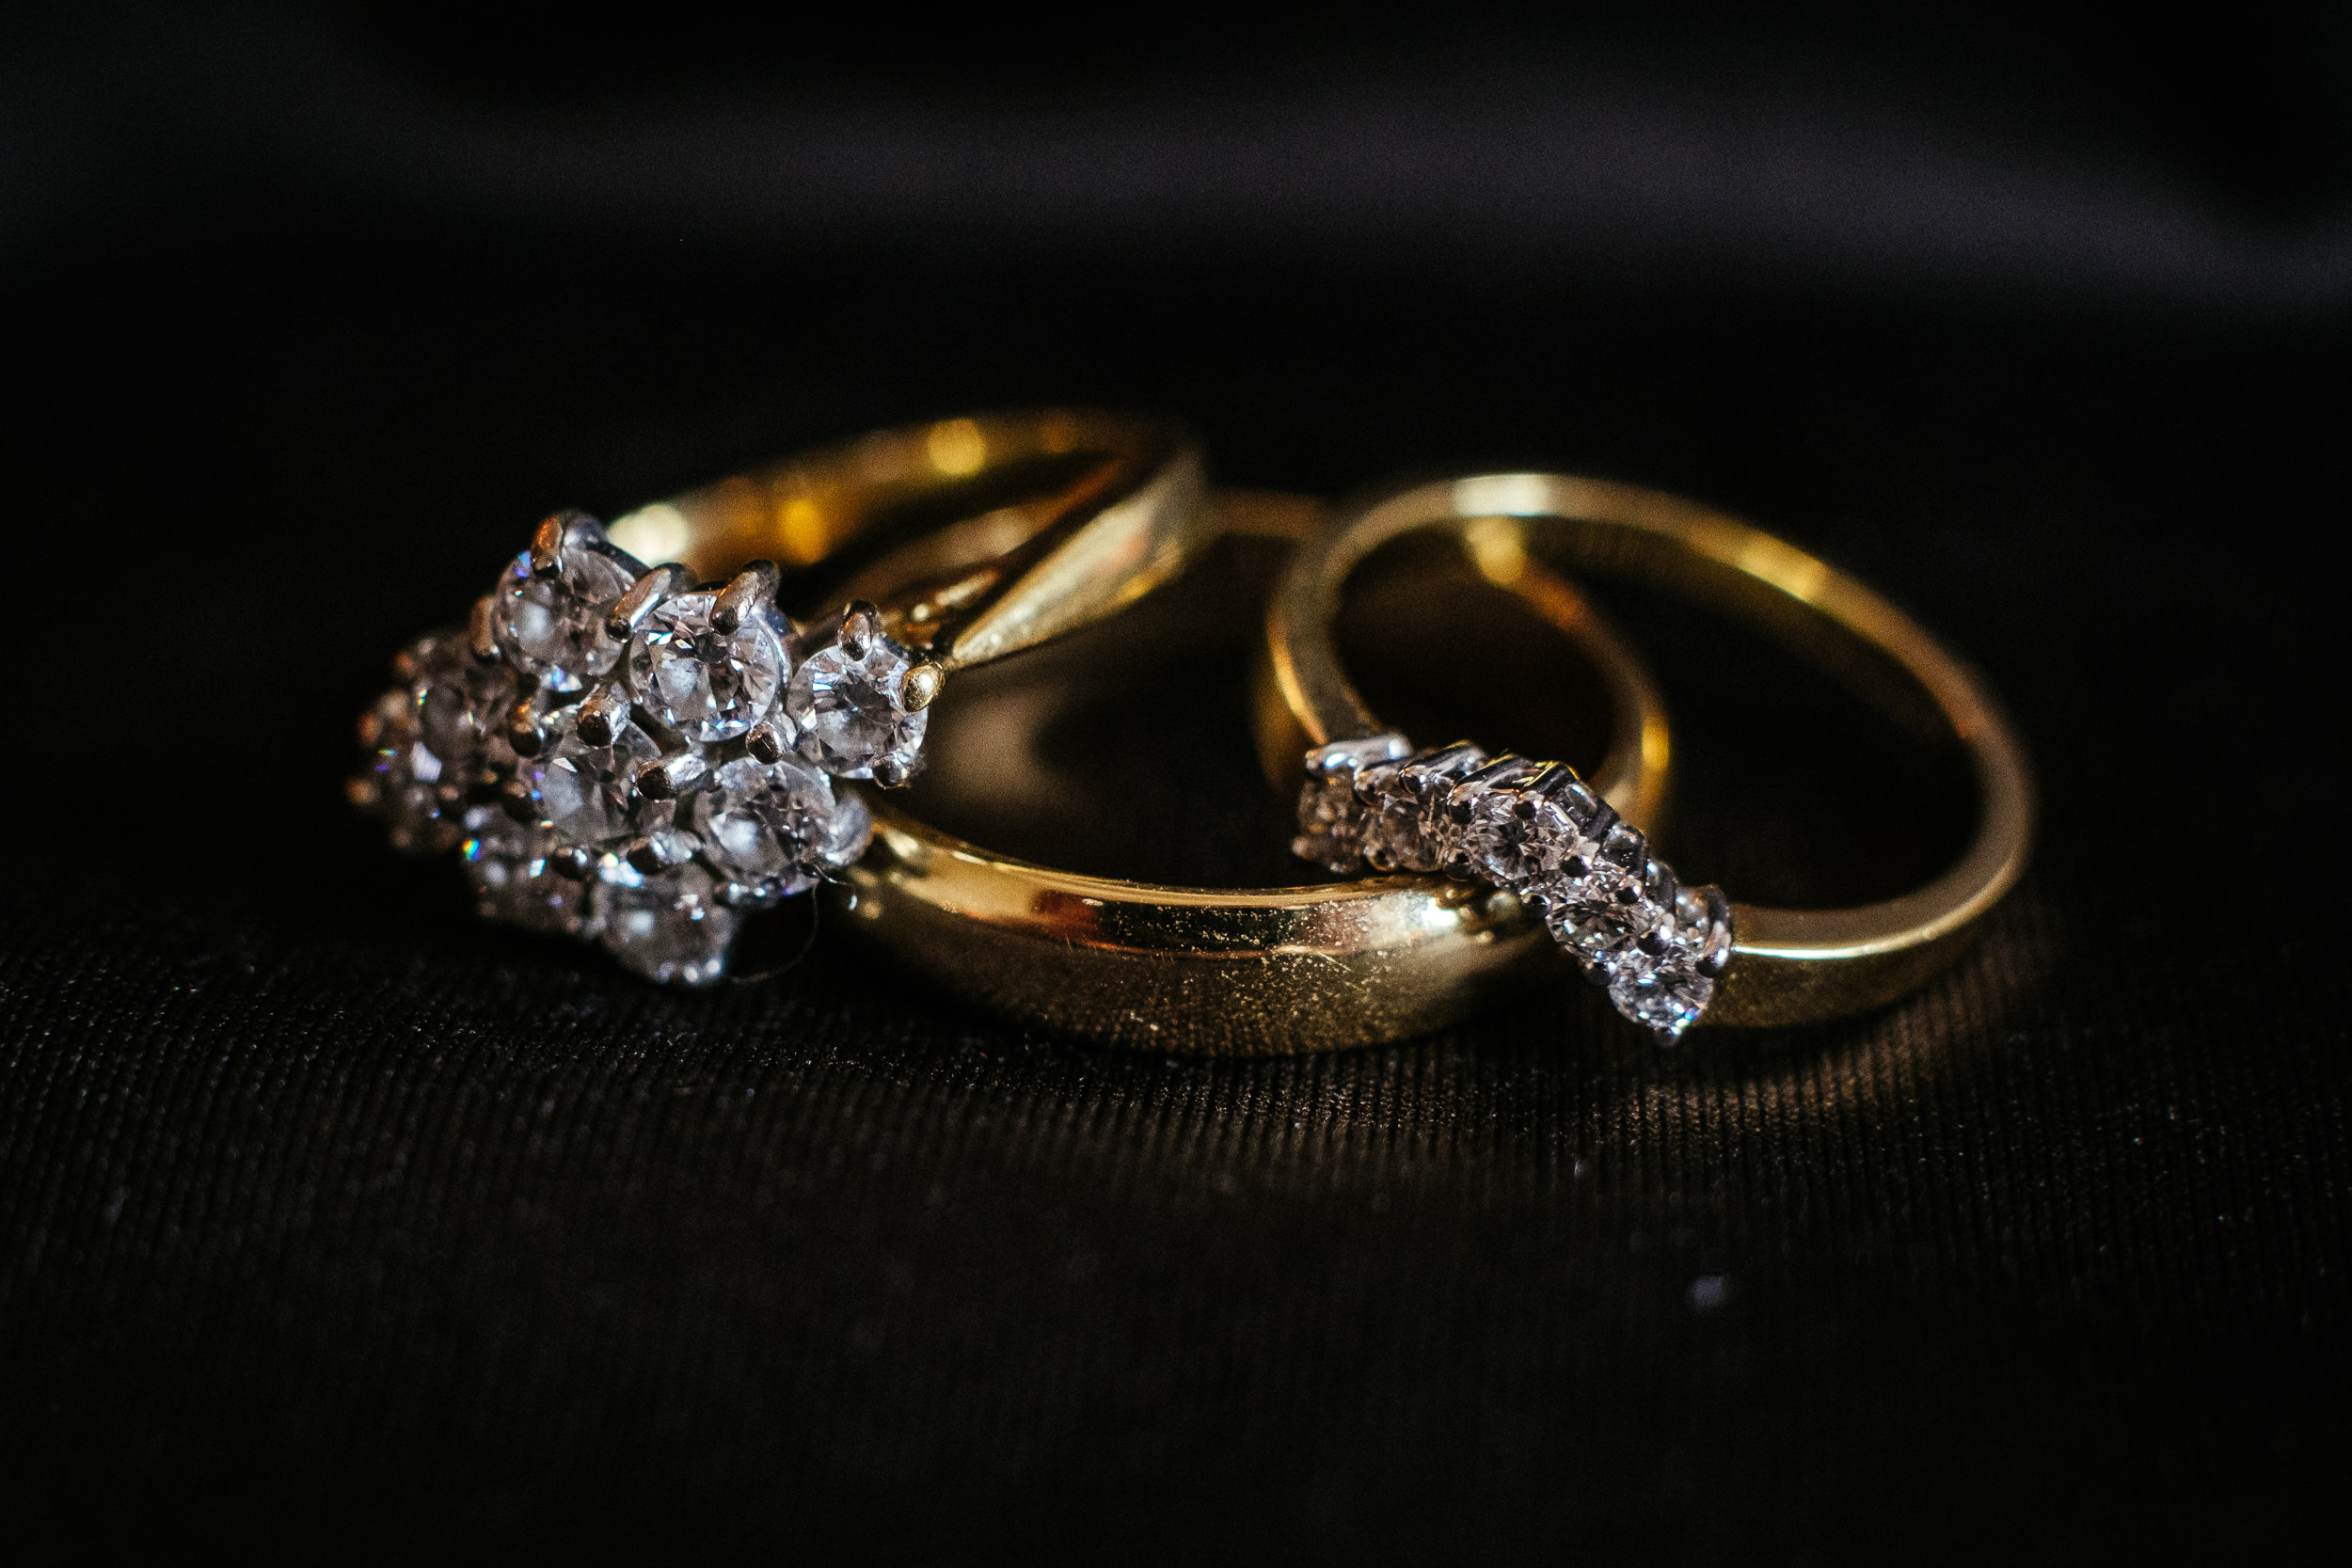 markree castle sligo Wedding Photographer 77